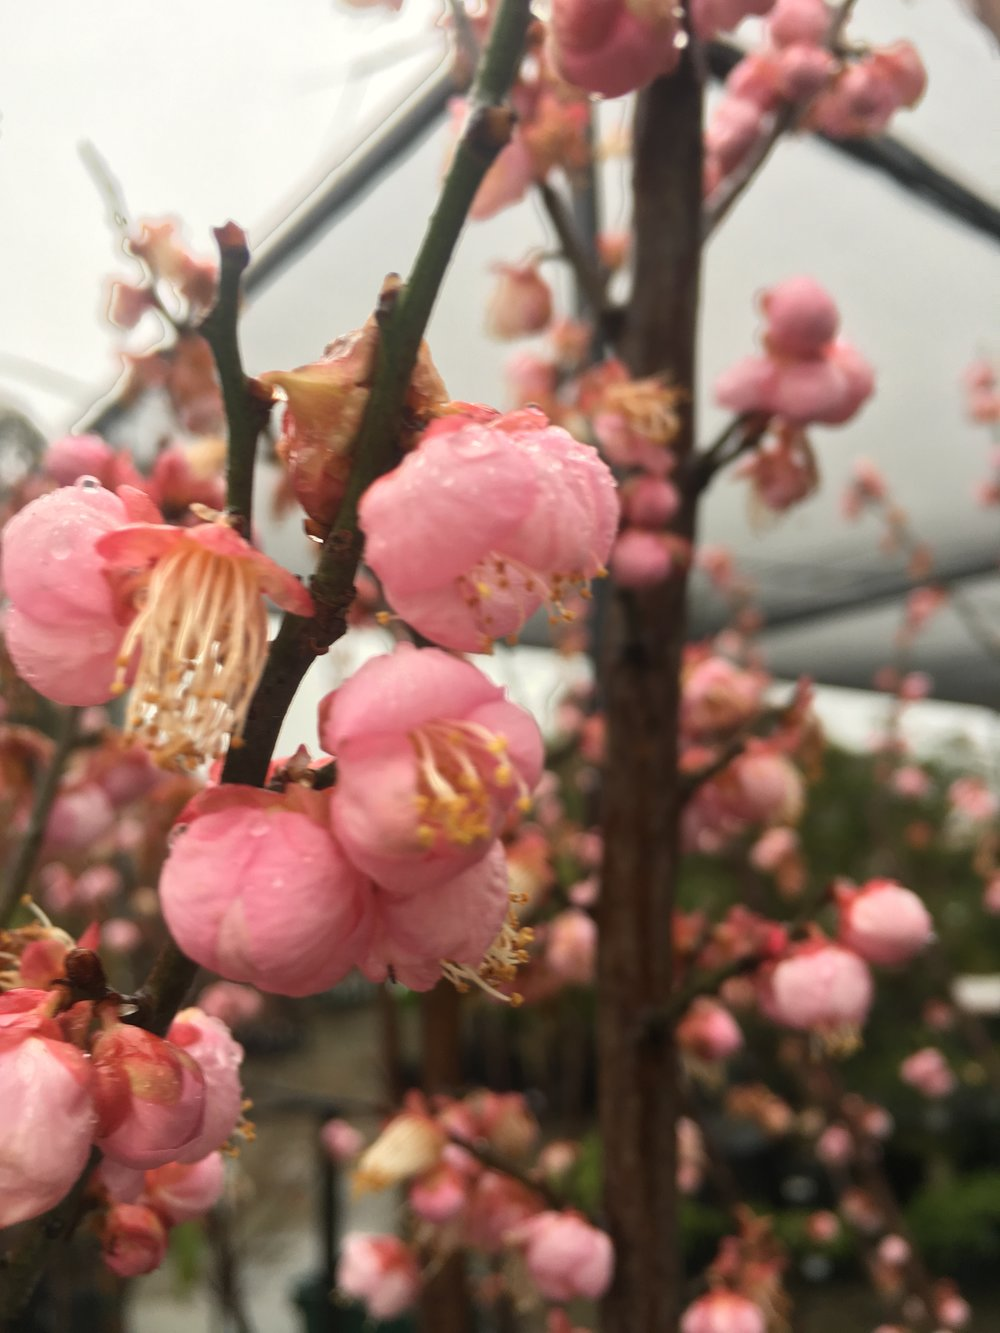 Prunus mume 'Morkel'